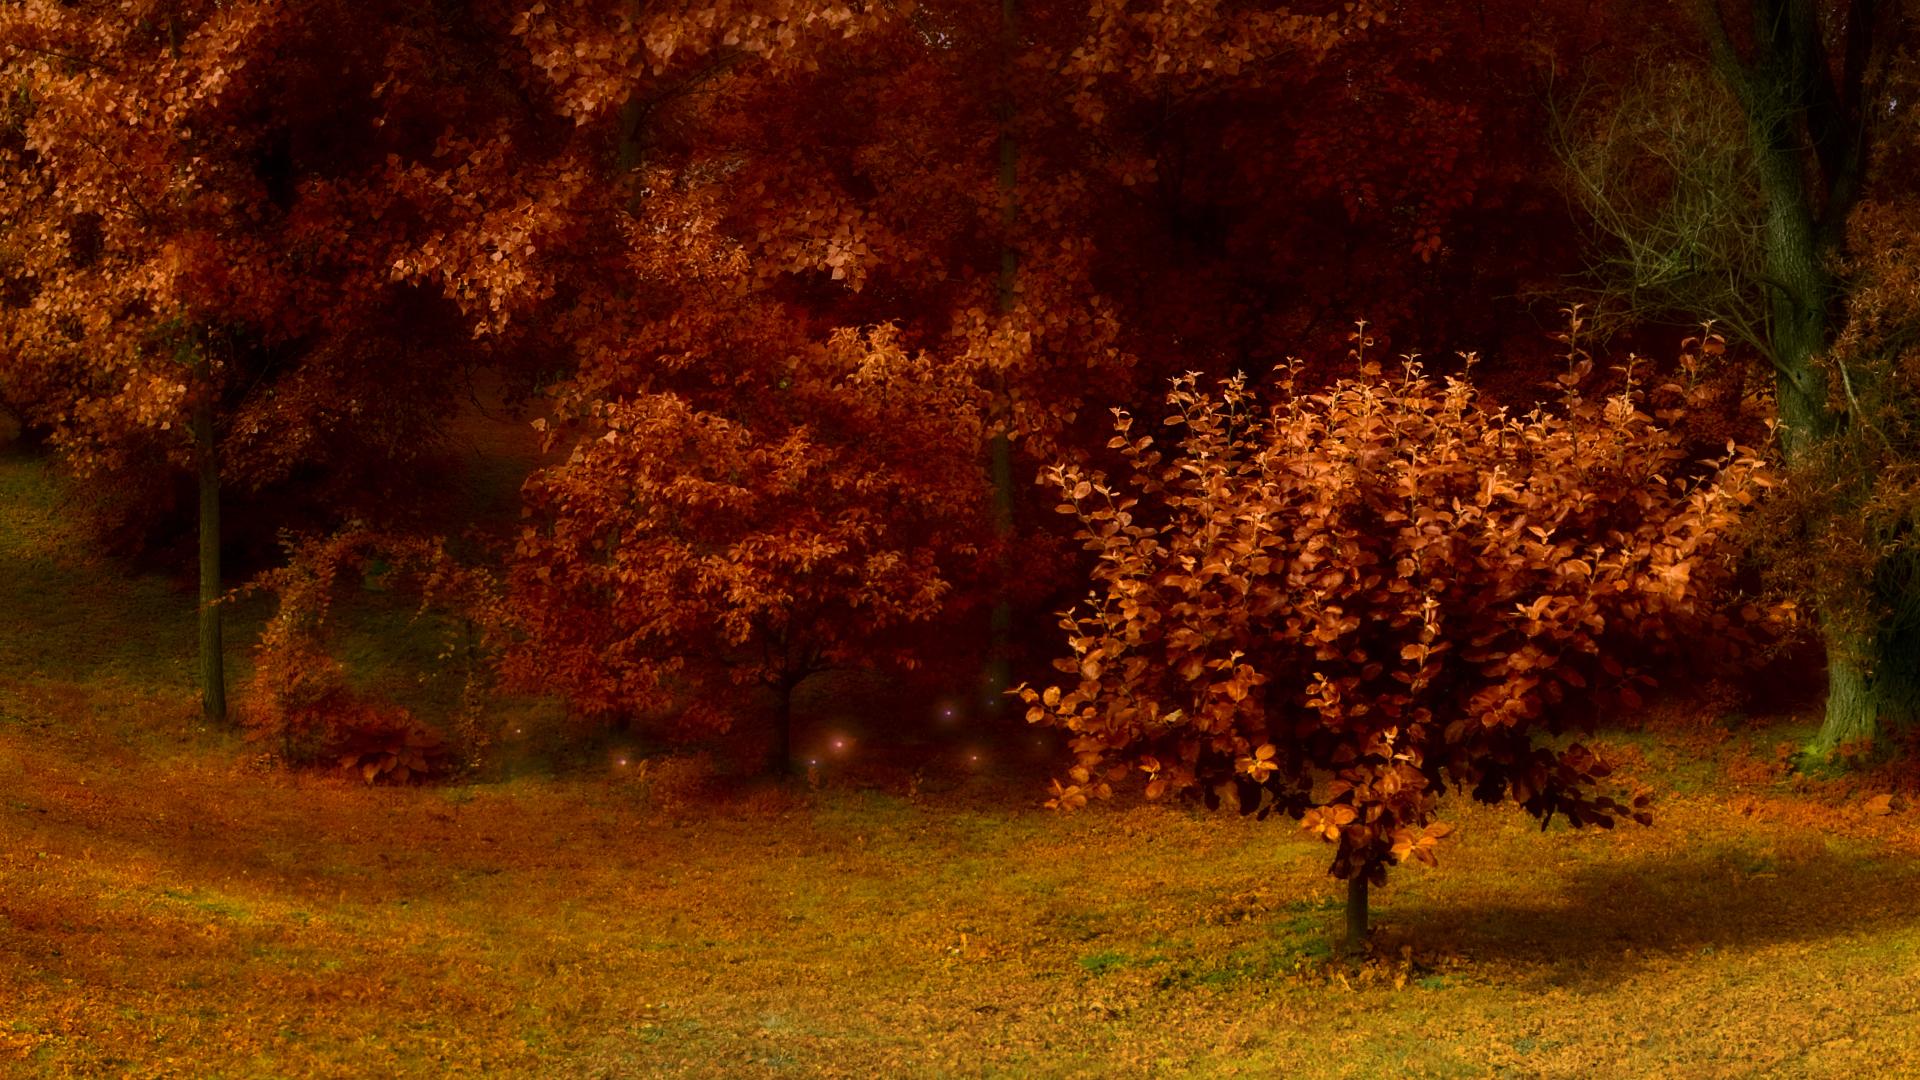 Autumn Trees HD Wallpaper 1080p HD Wallpapers 1920x1080